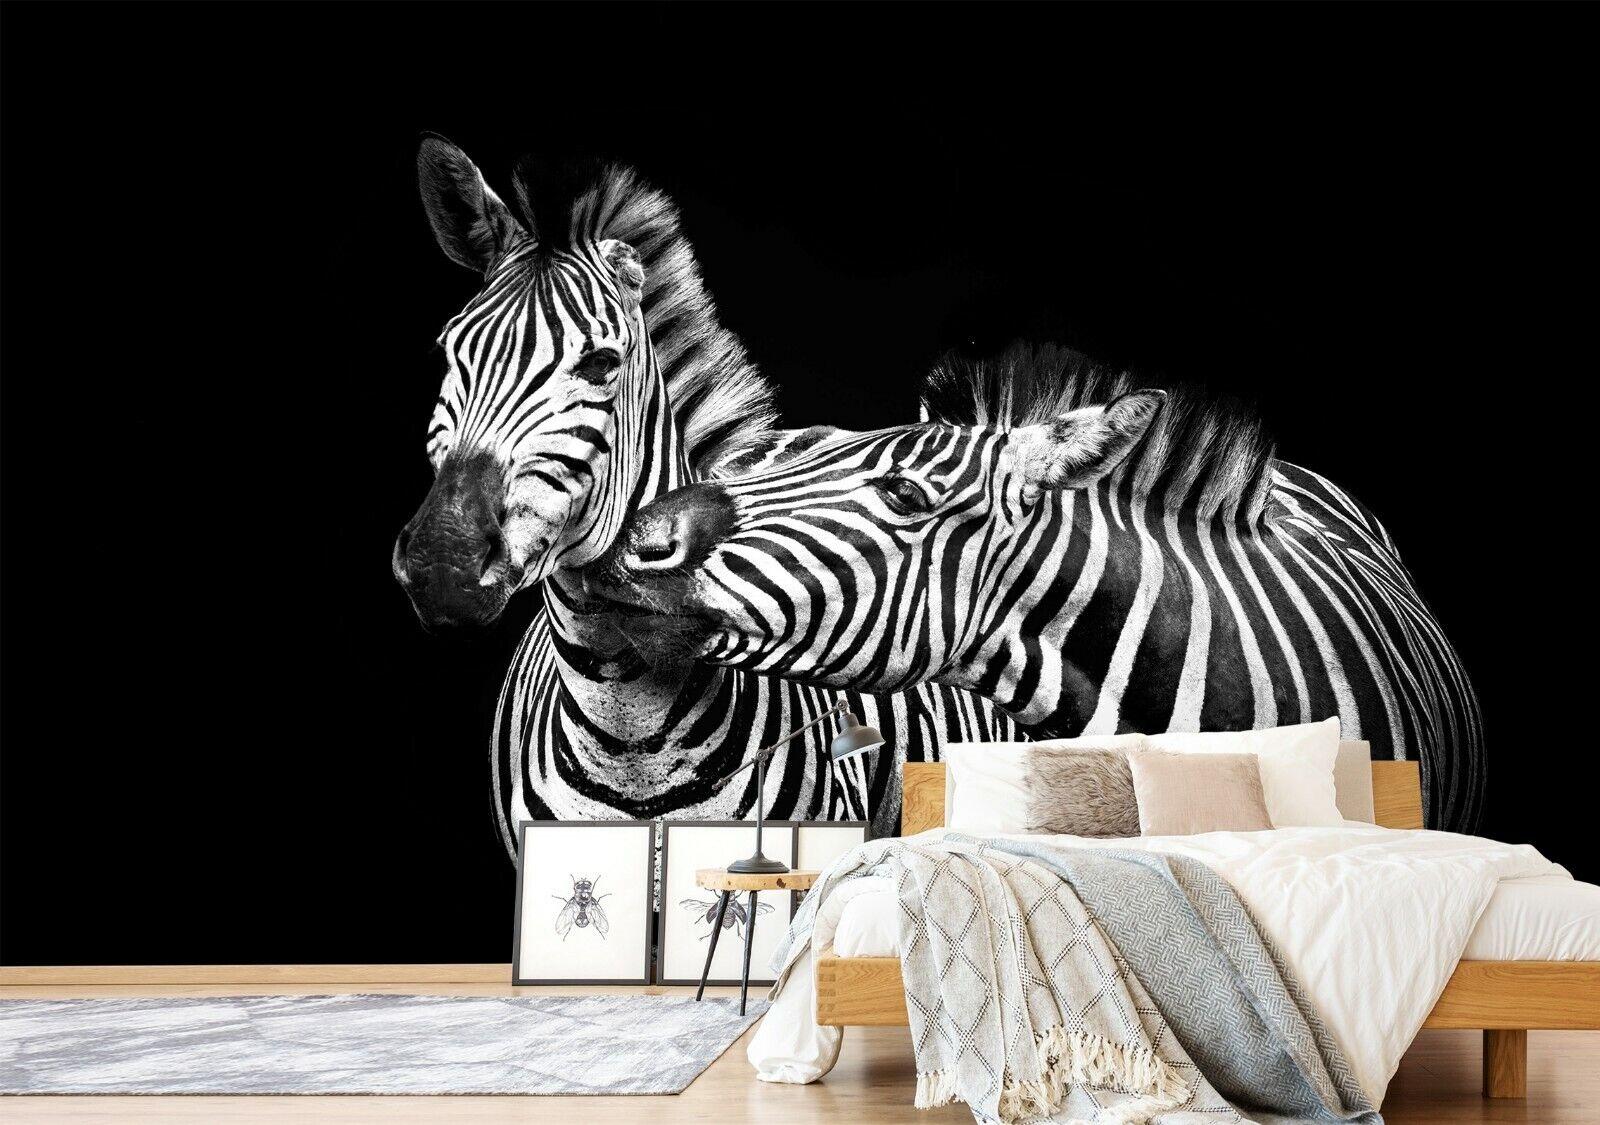 3D Zebra Liebe H112 Tier Tapete Wandbild Selbstklebend Abnehmbare Angelia